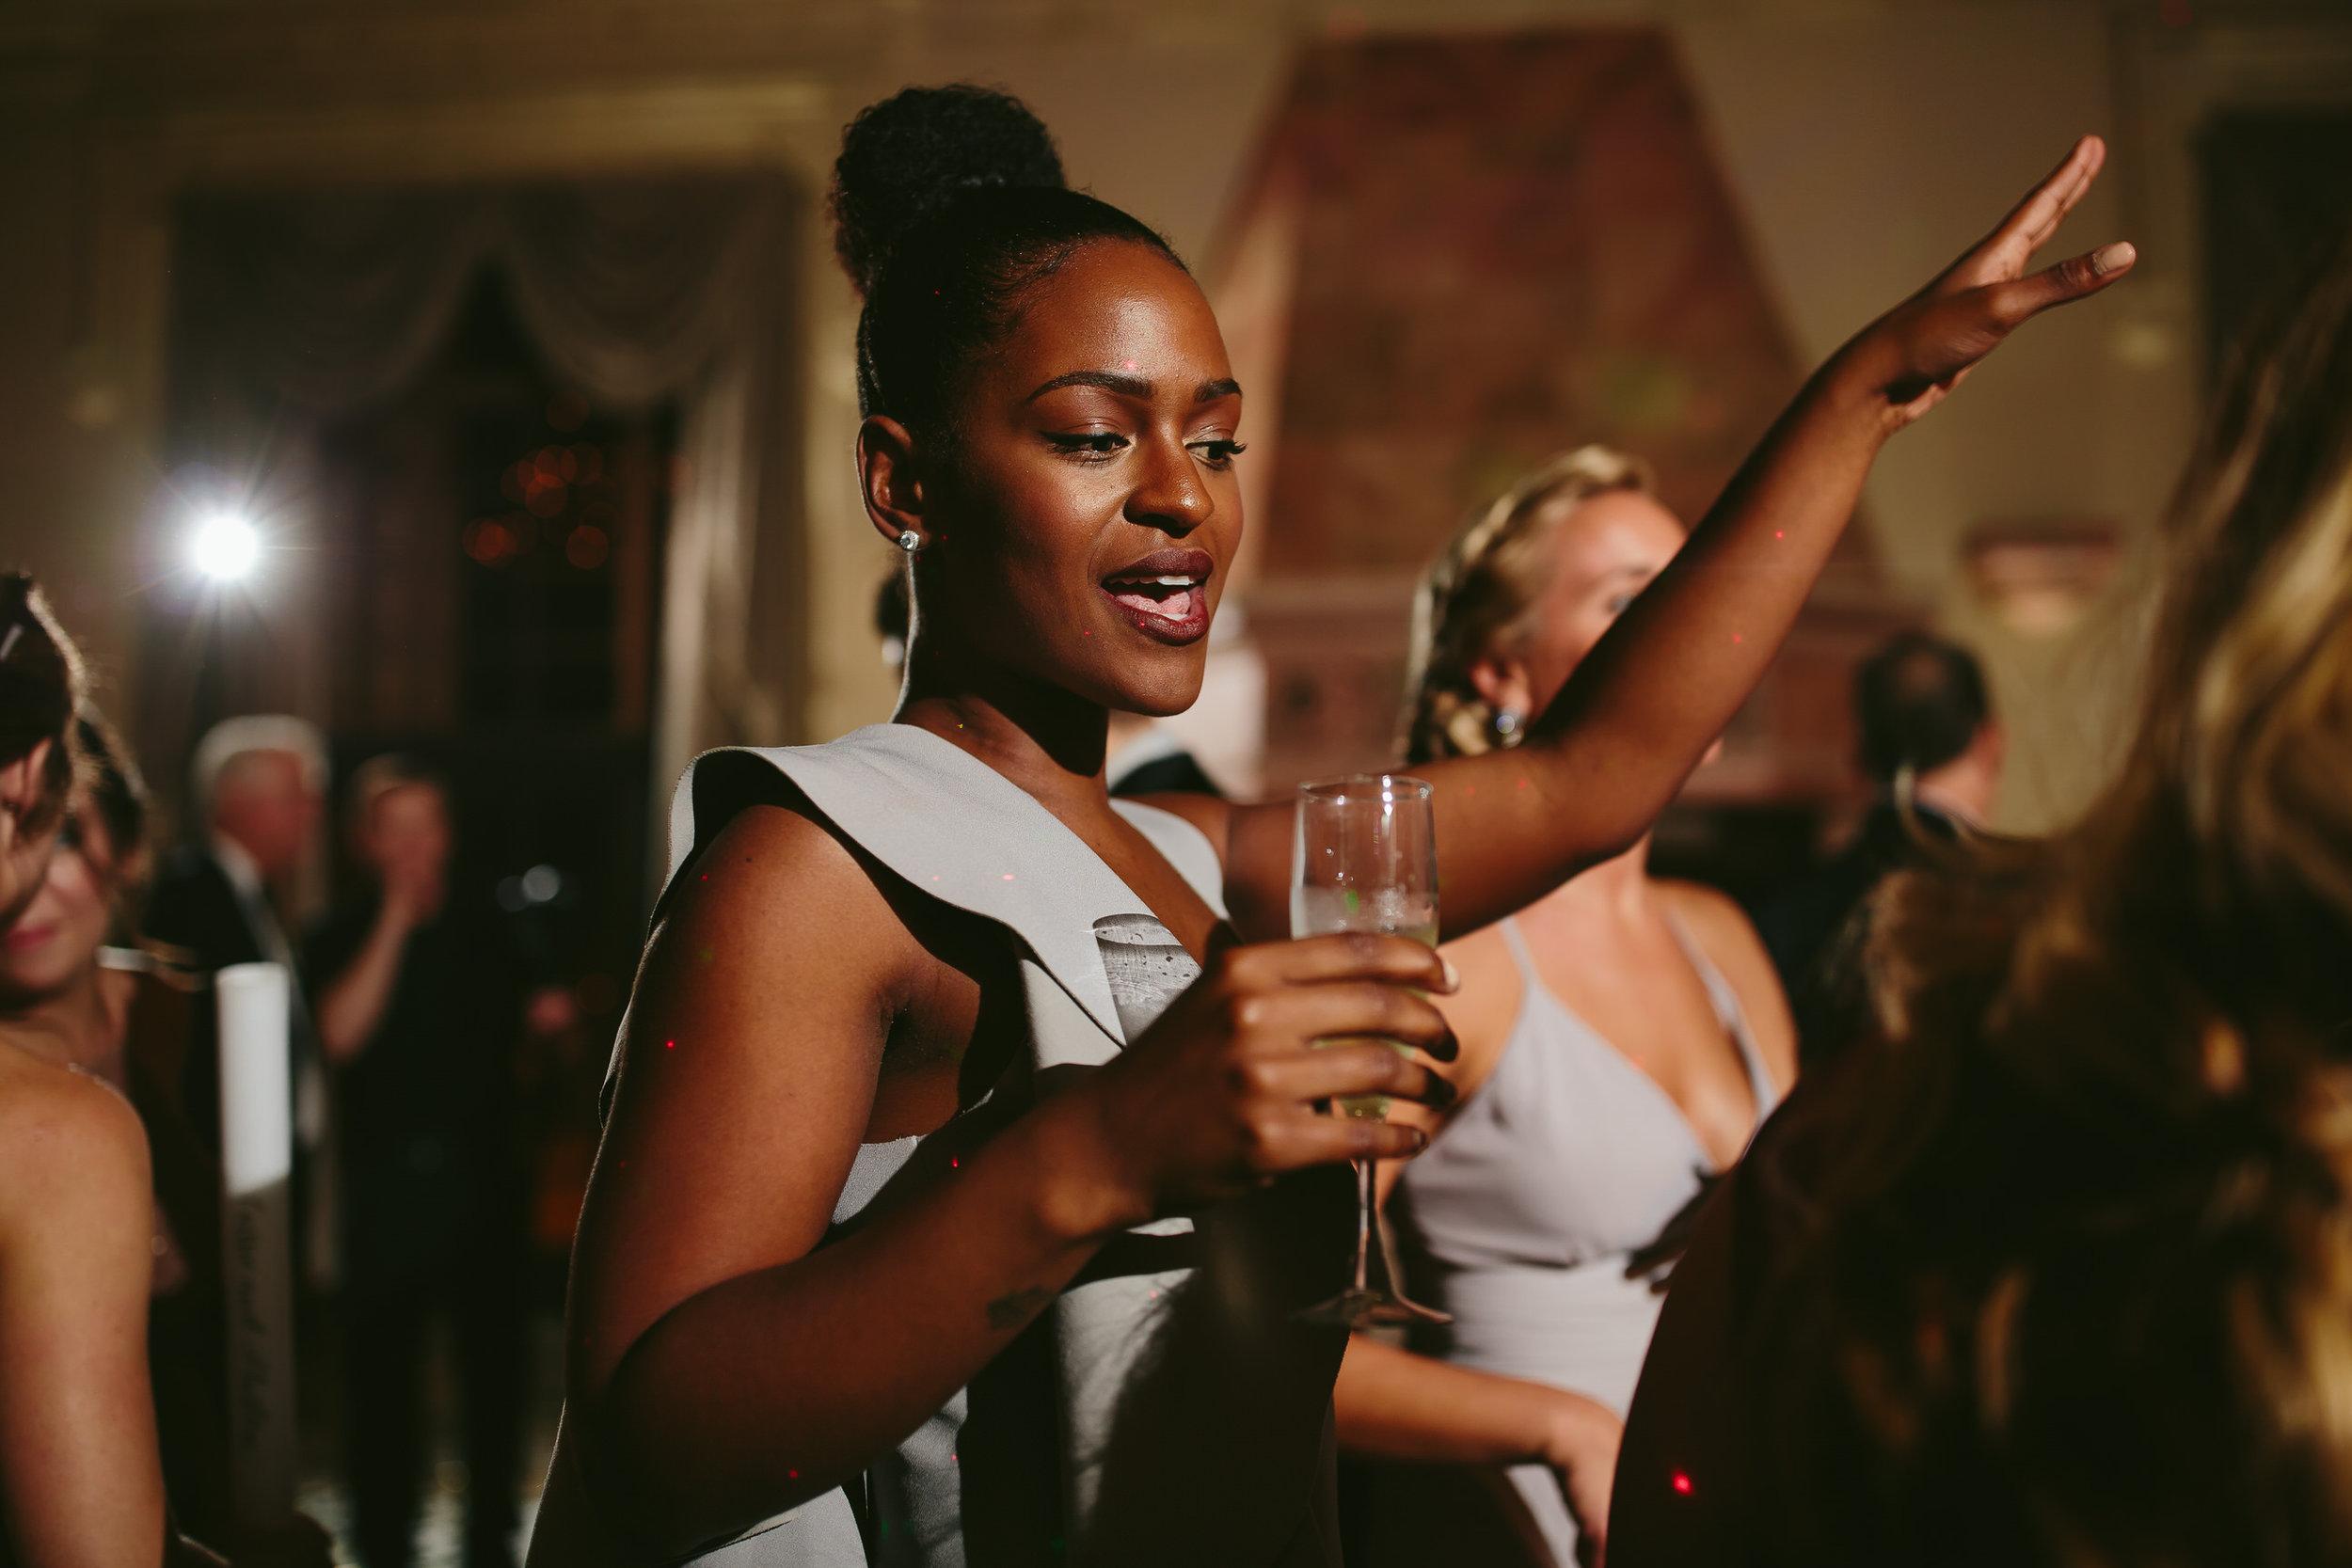 miami-biltmore-wedding-photographer-reception-party-44.jpg